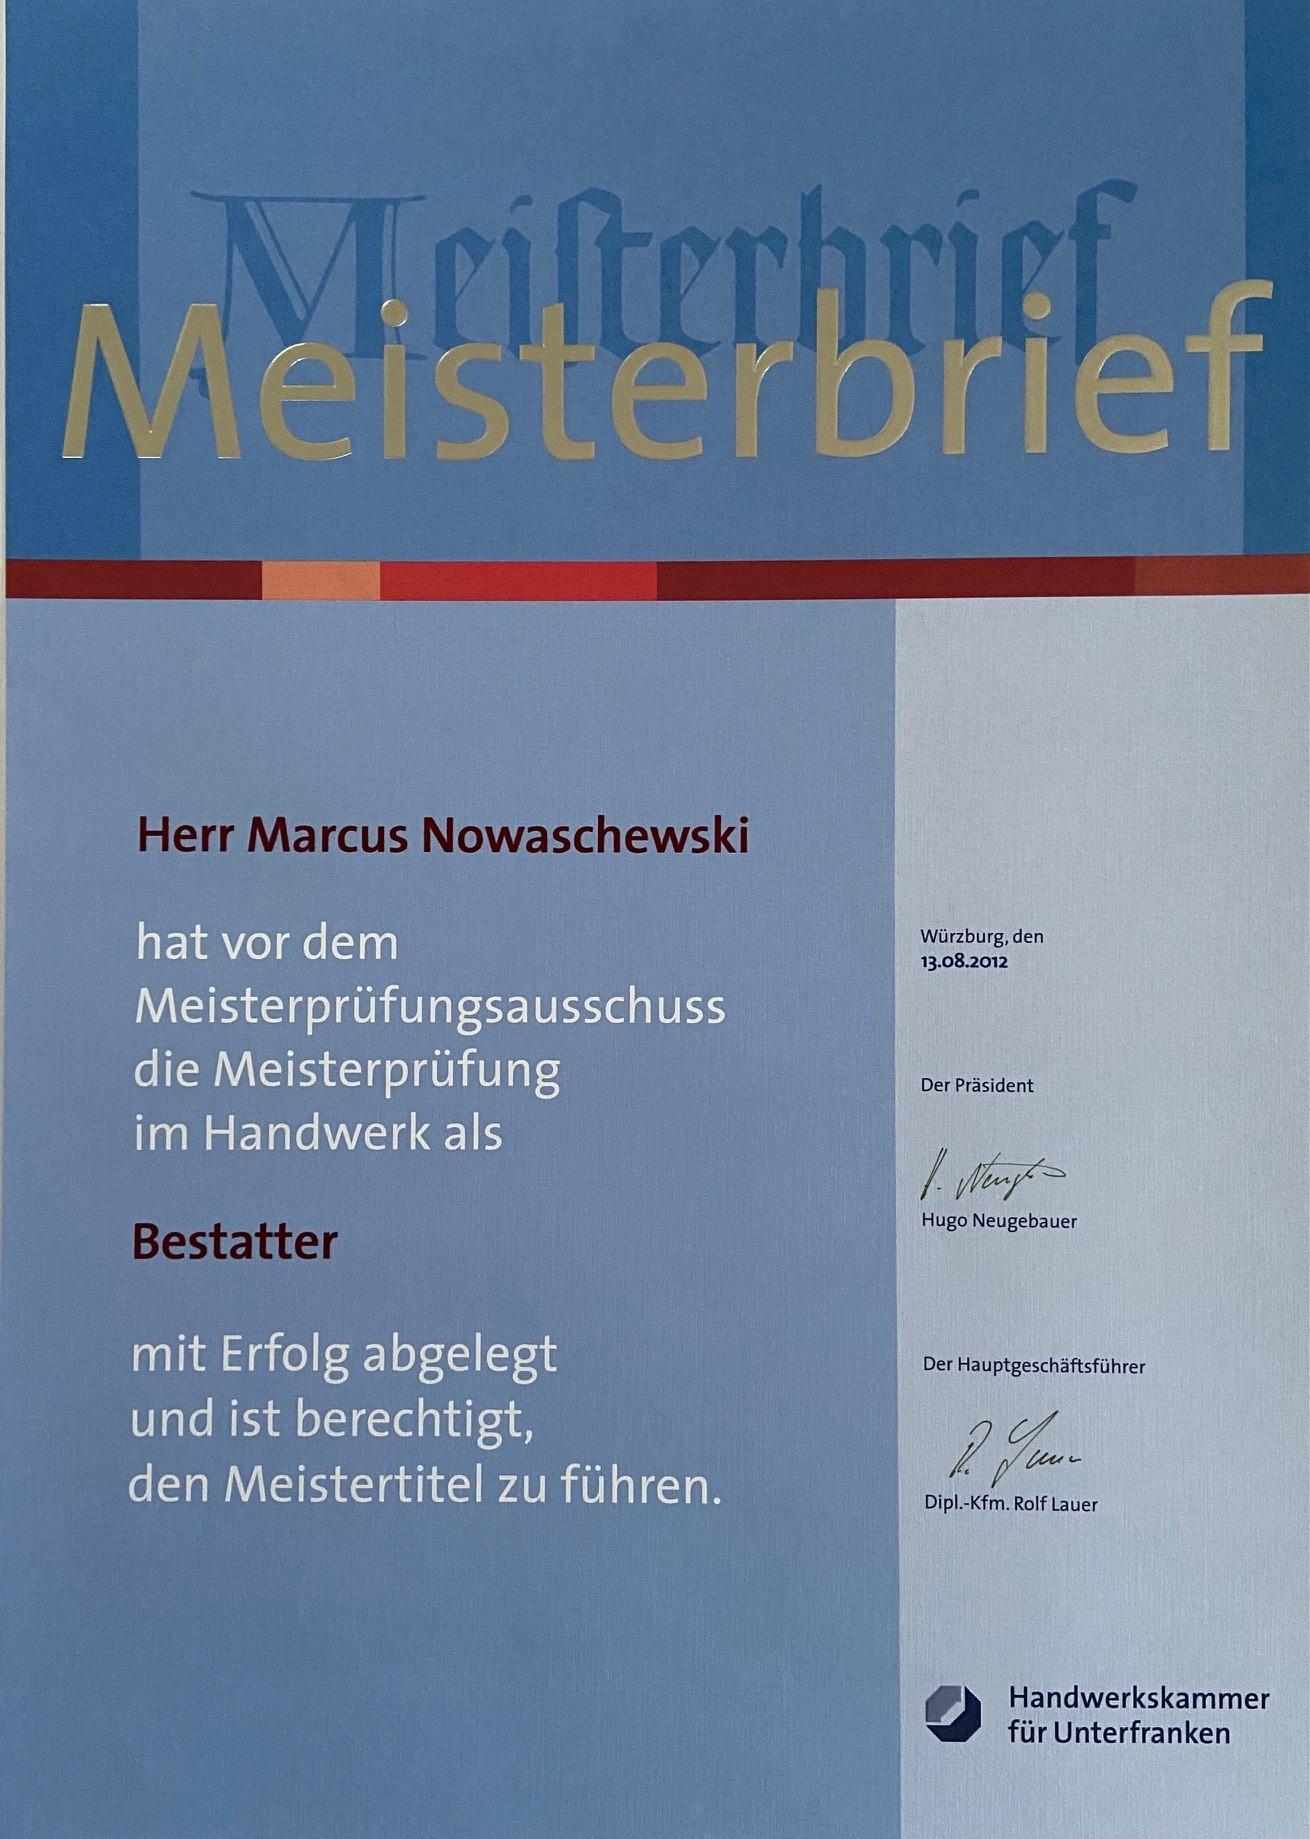 Meisterbrief Marcus